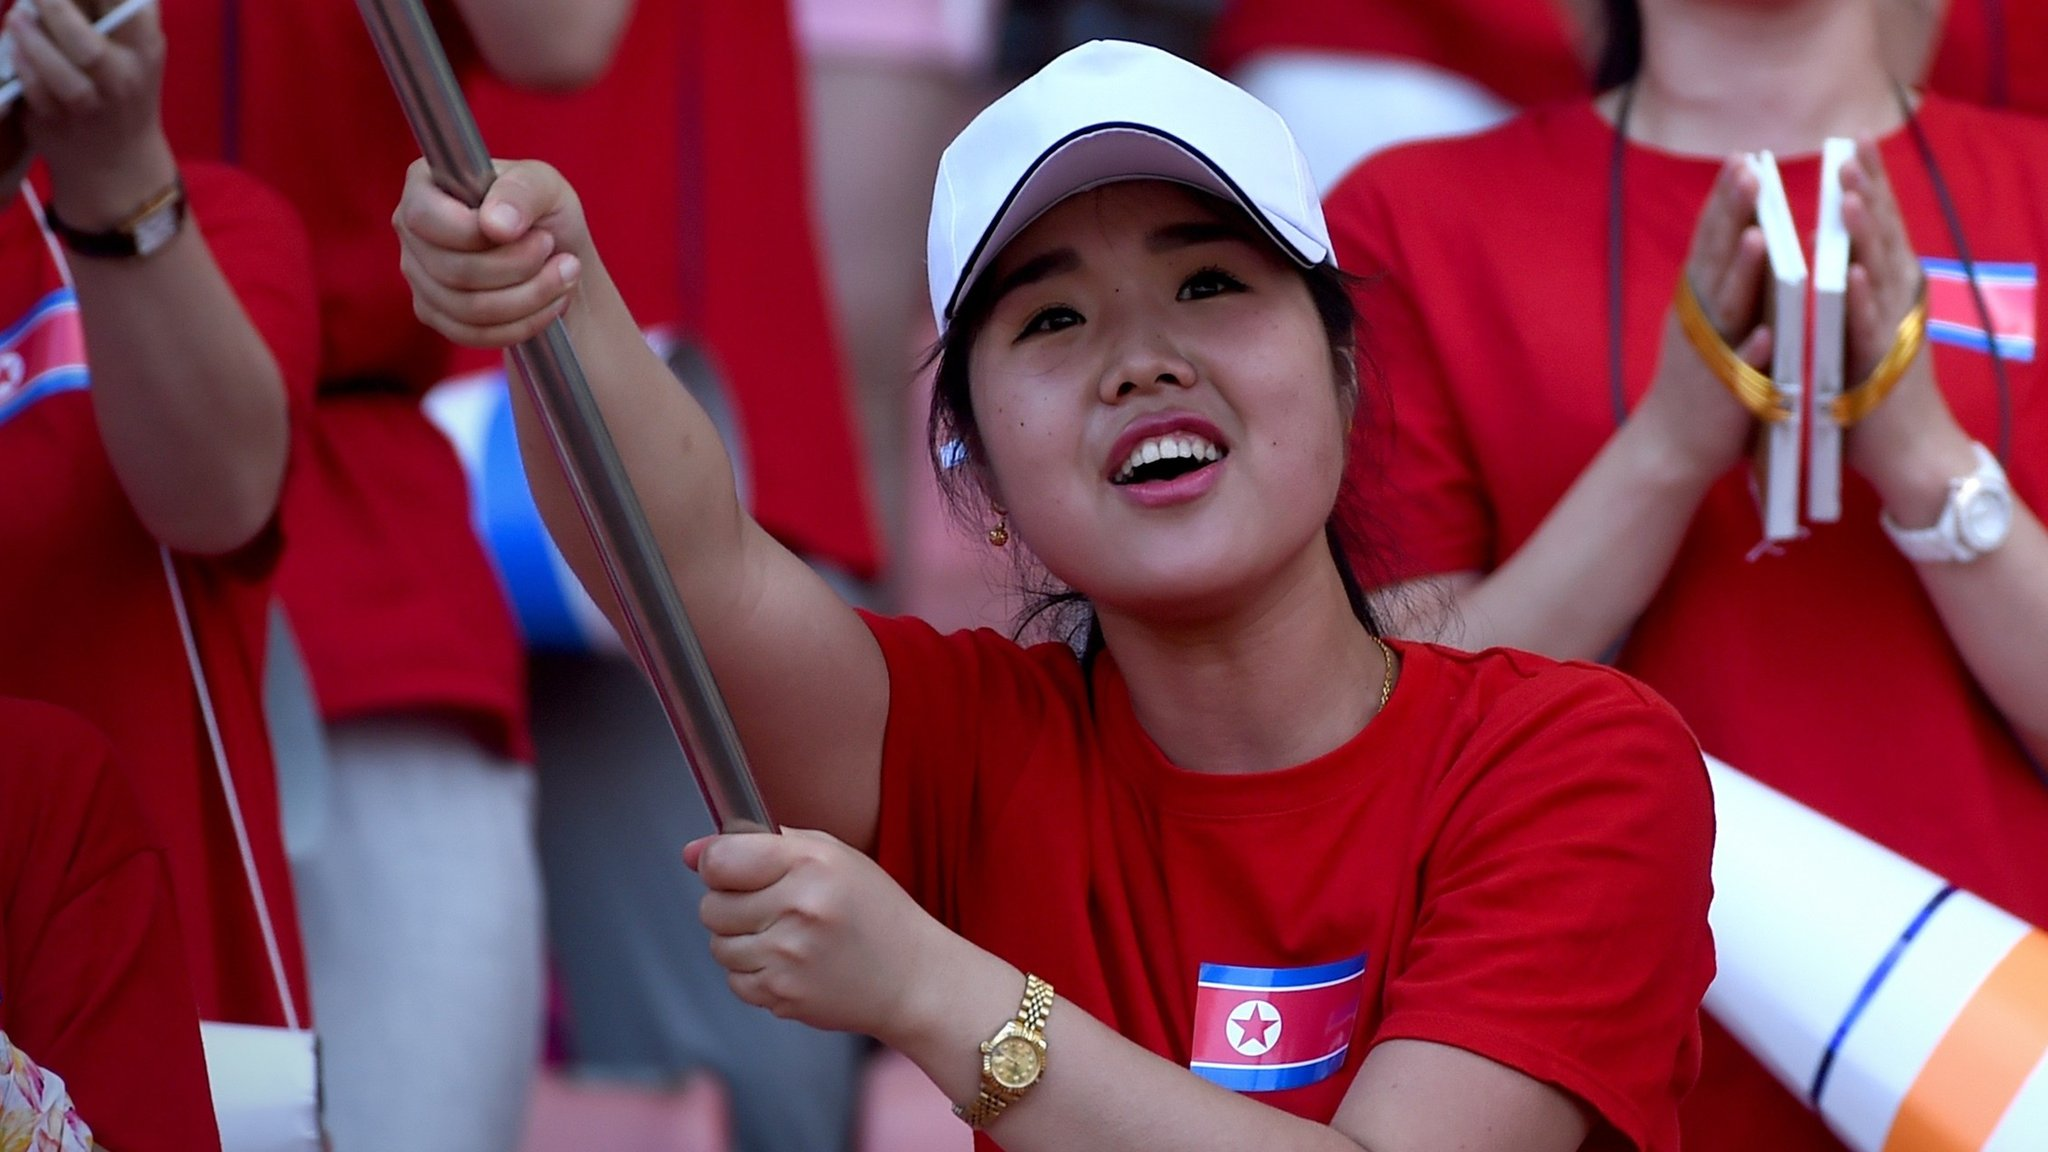 Winter Olympics: How good is North Korea at sport?